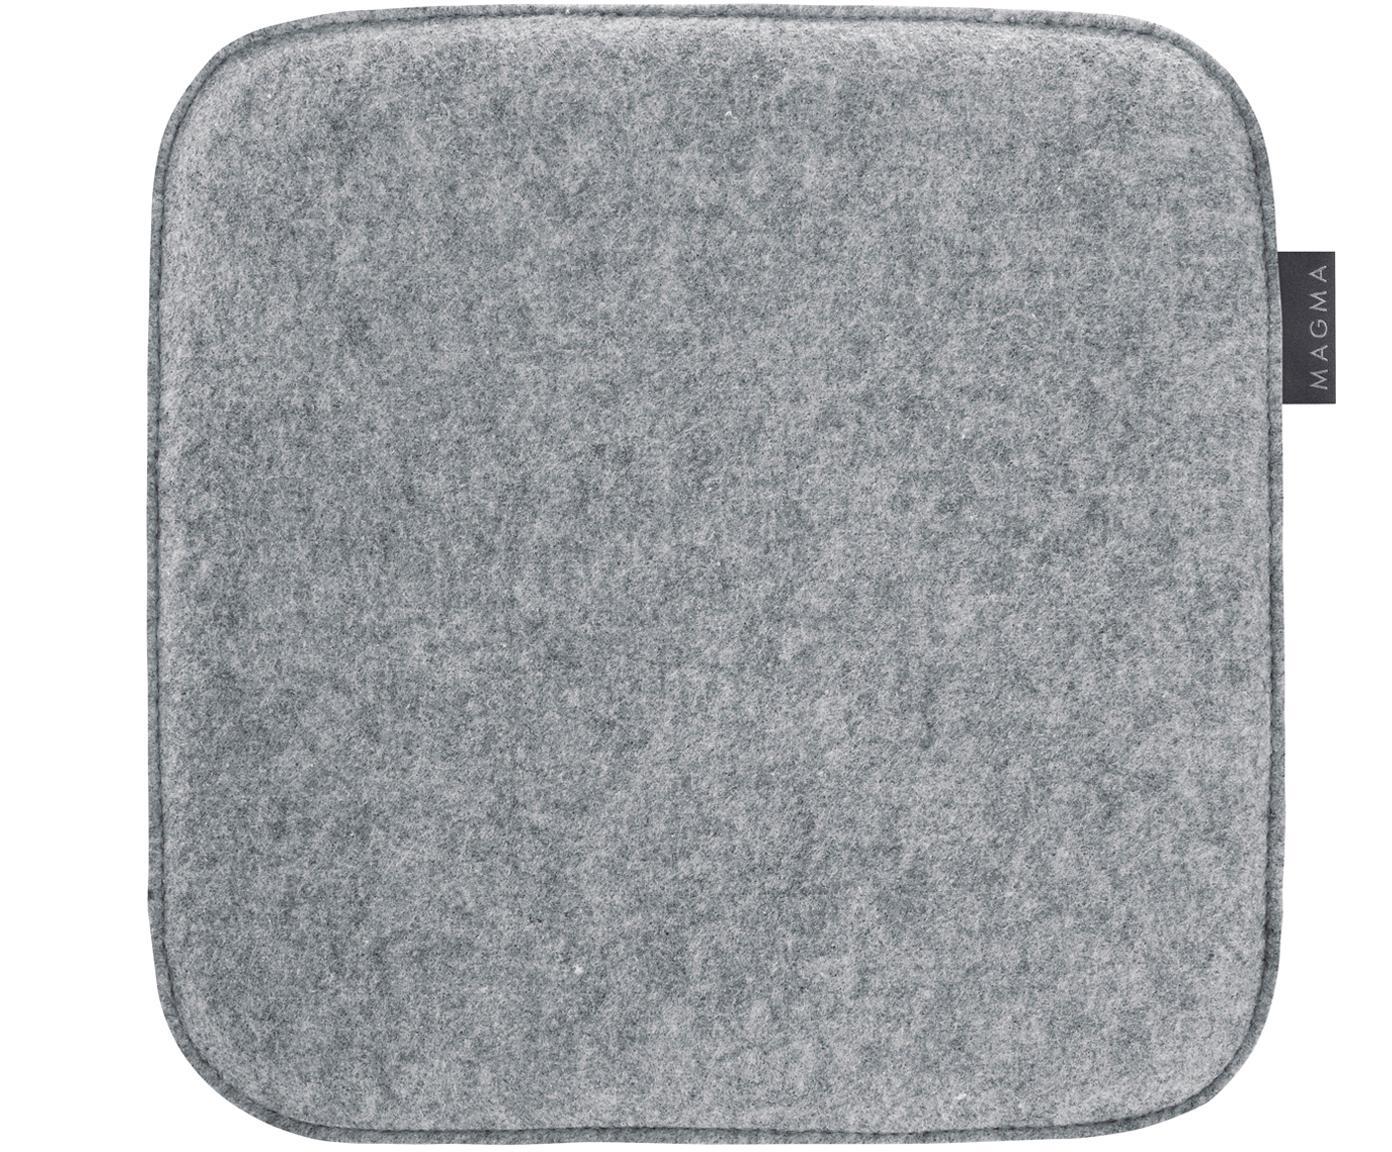 Nakładka na krzesło Avaro Square, 4 elem., Szary, S 35 x D 35 cm